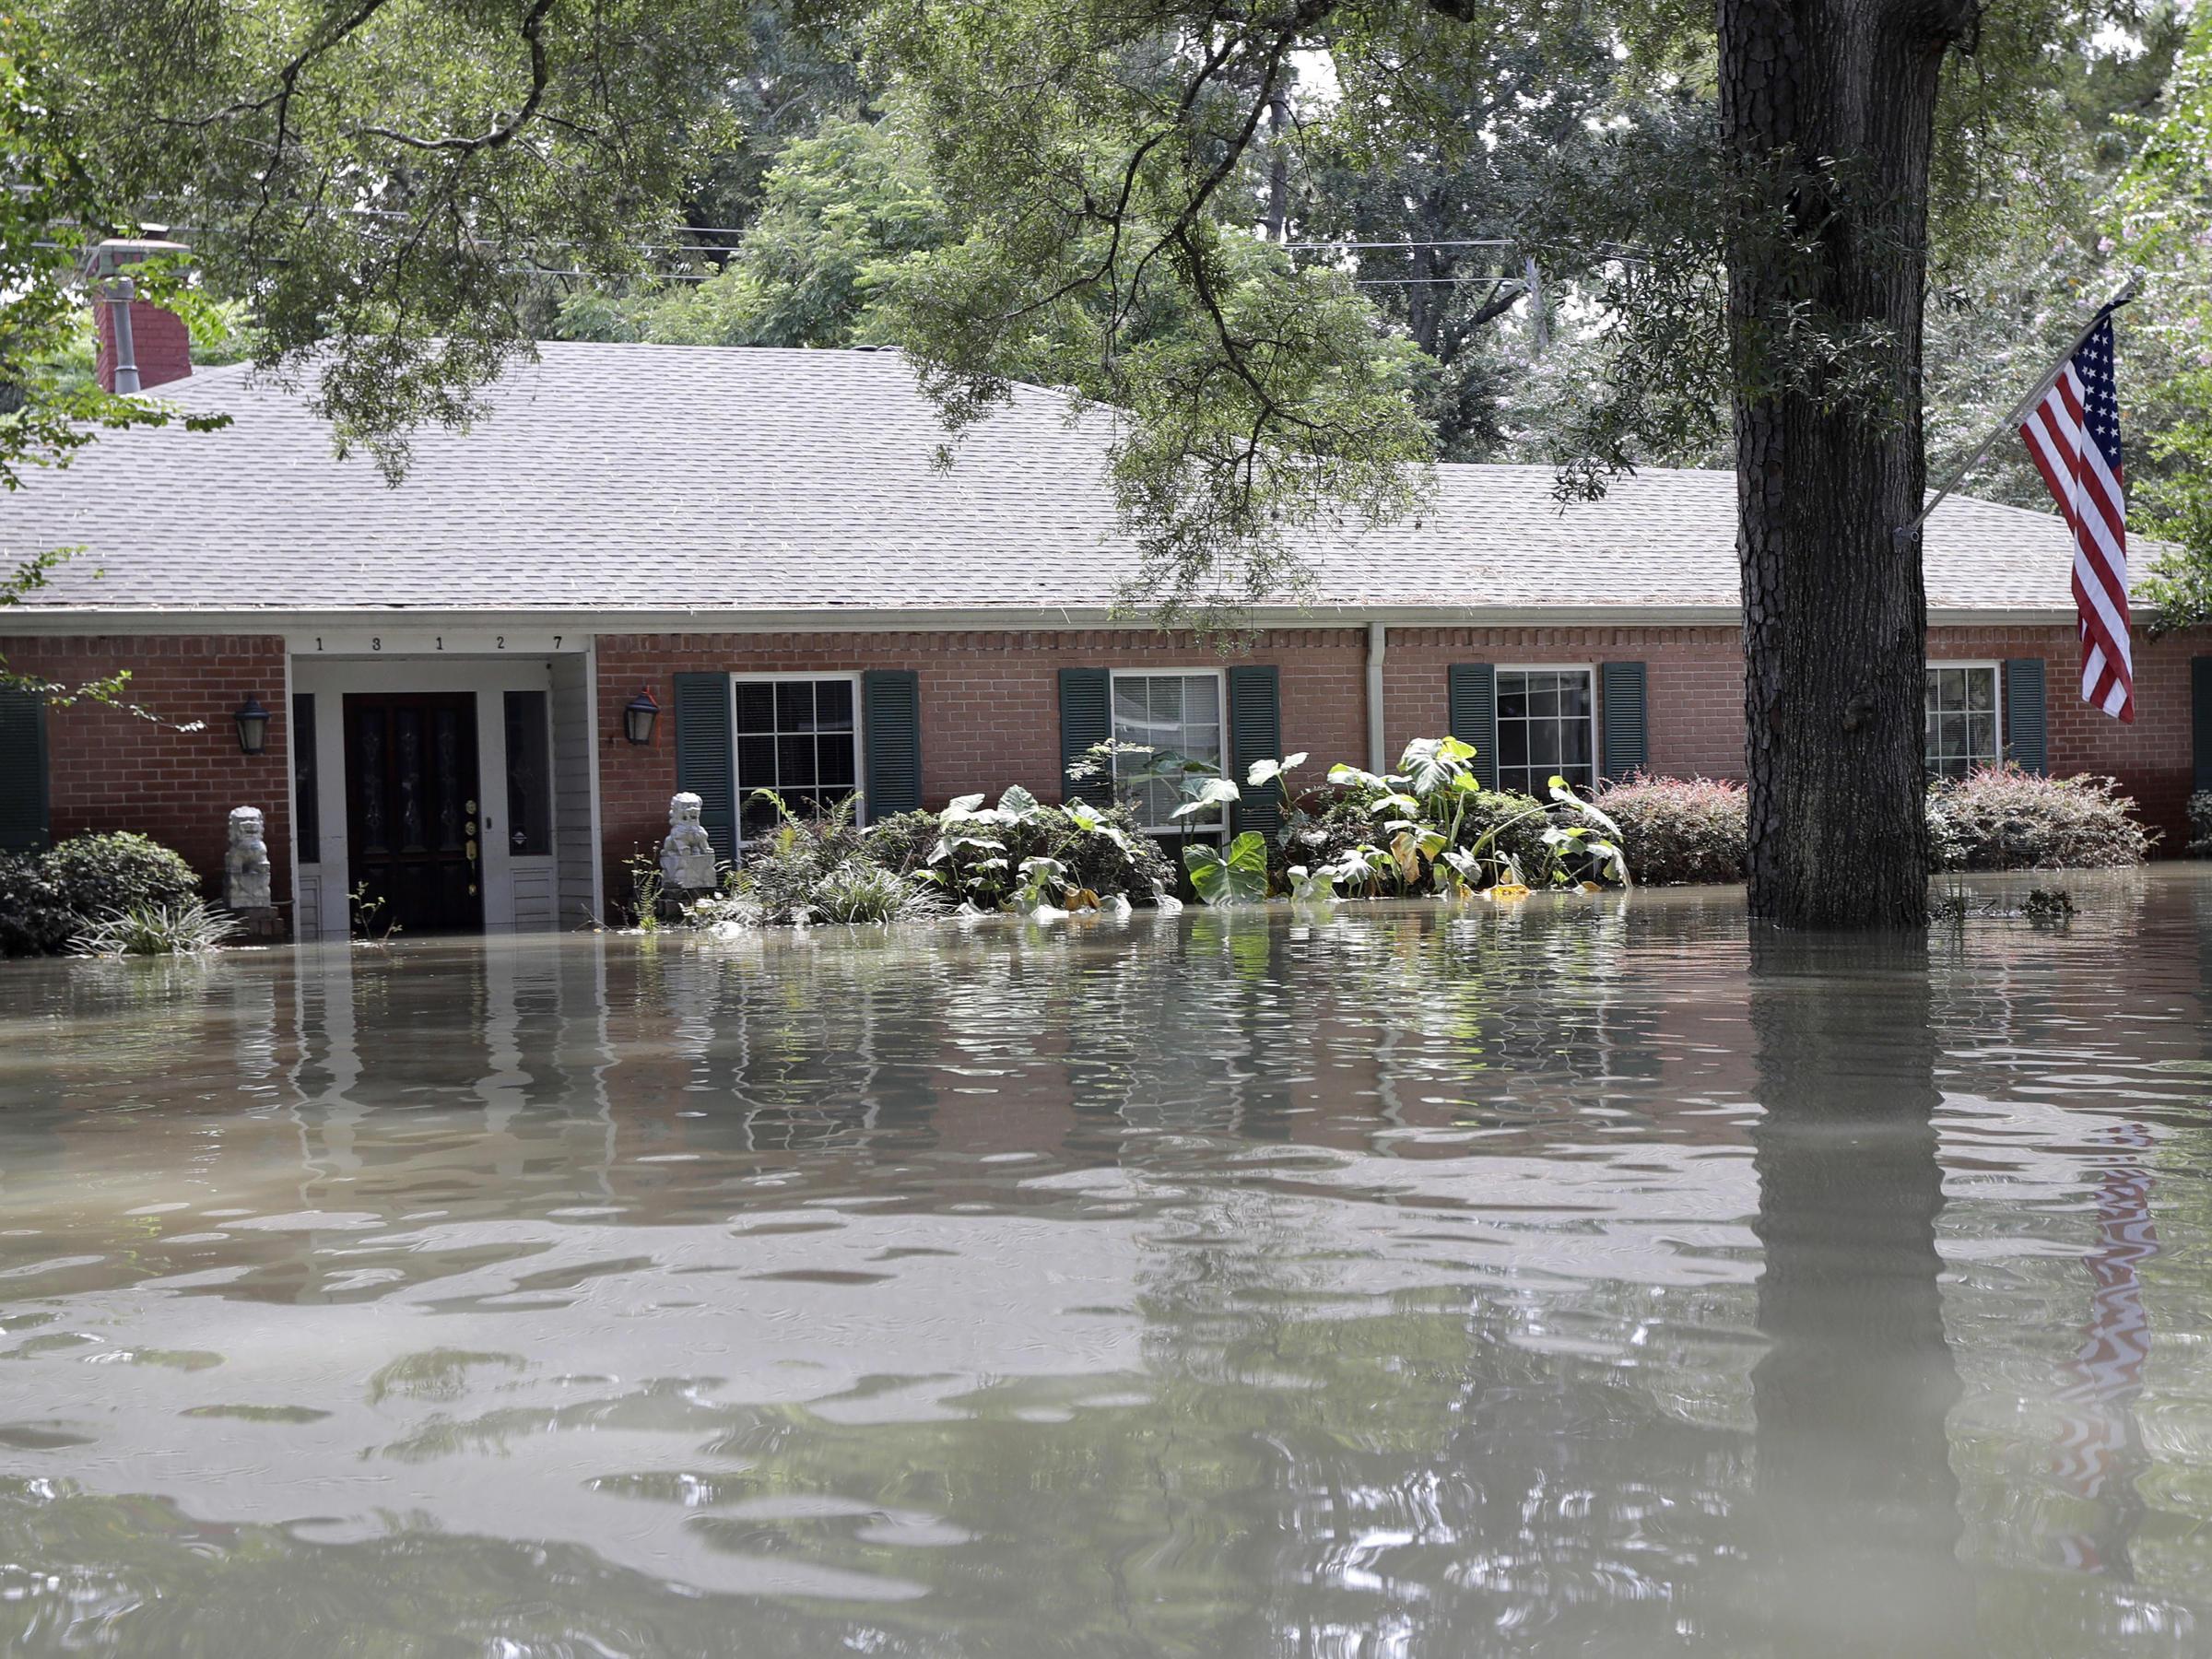 Texas Announces $1 Billion For Mitigation Efforts After Harvey